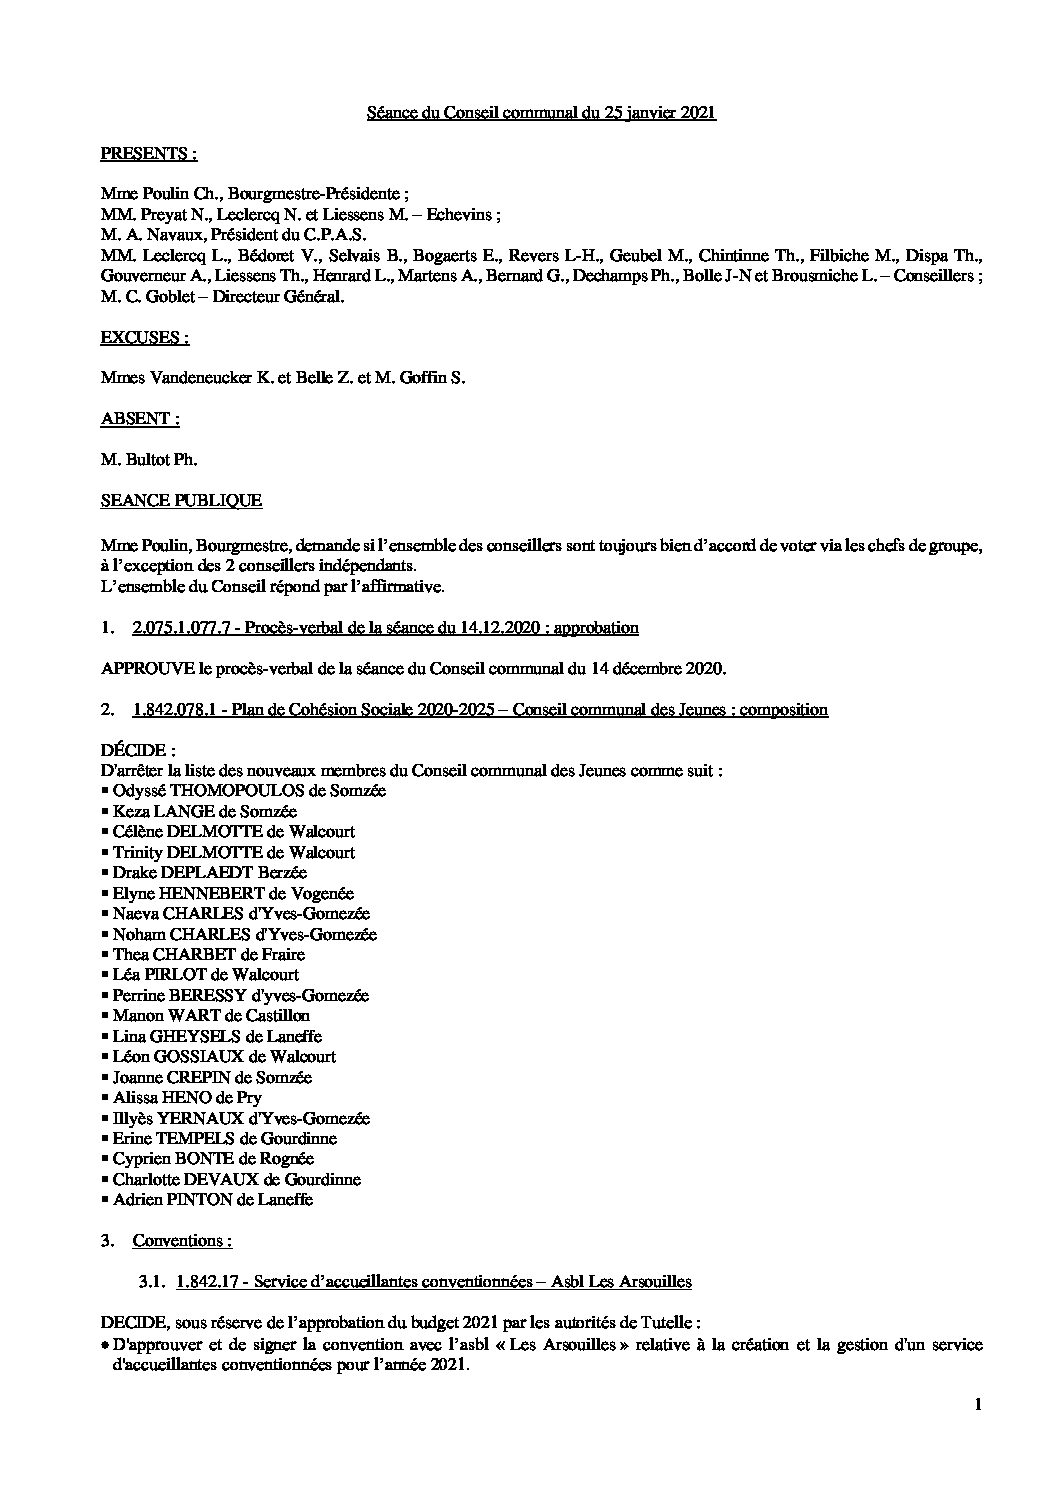 Conseil communal – 25 janvier 2021